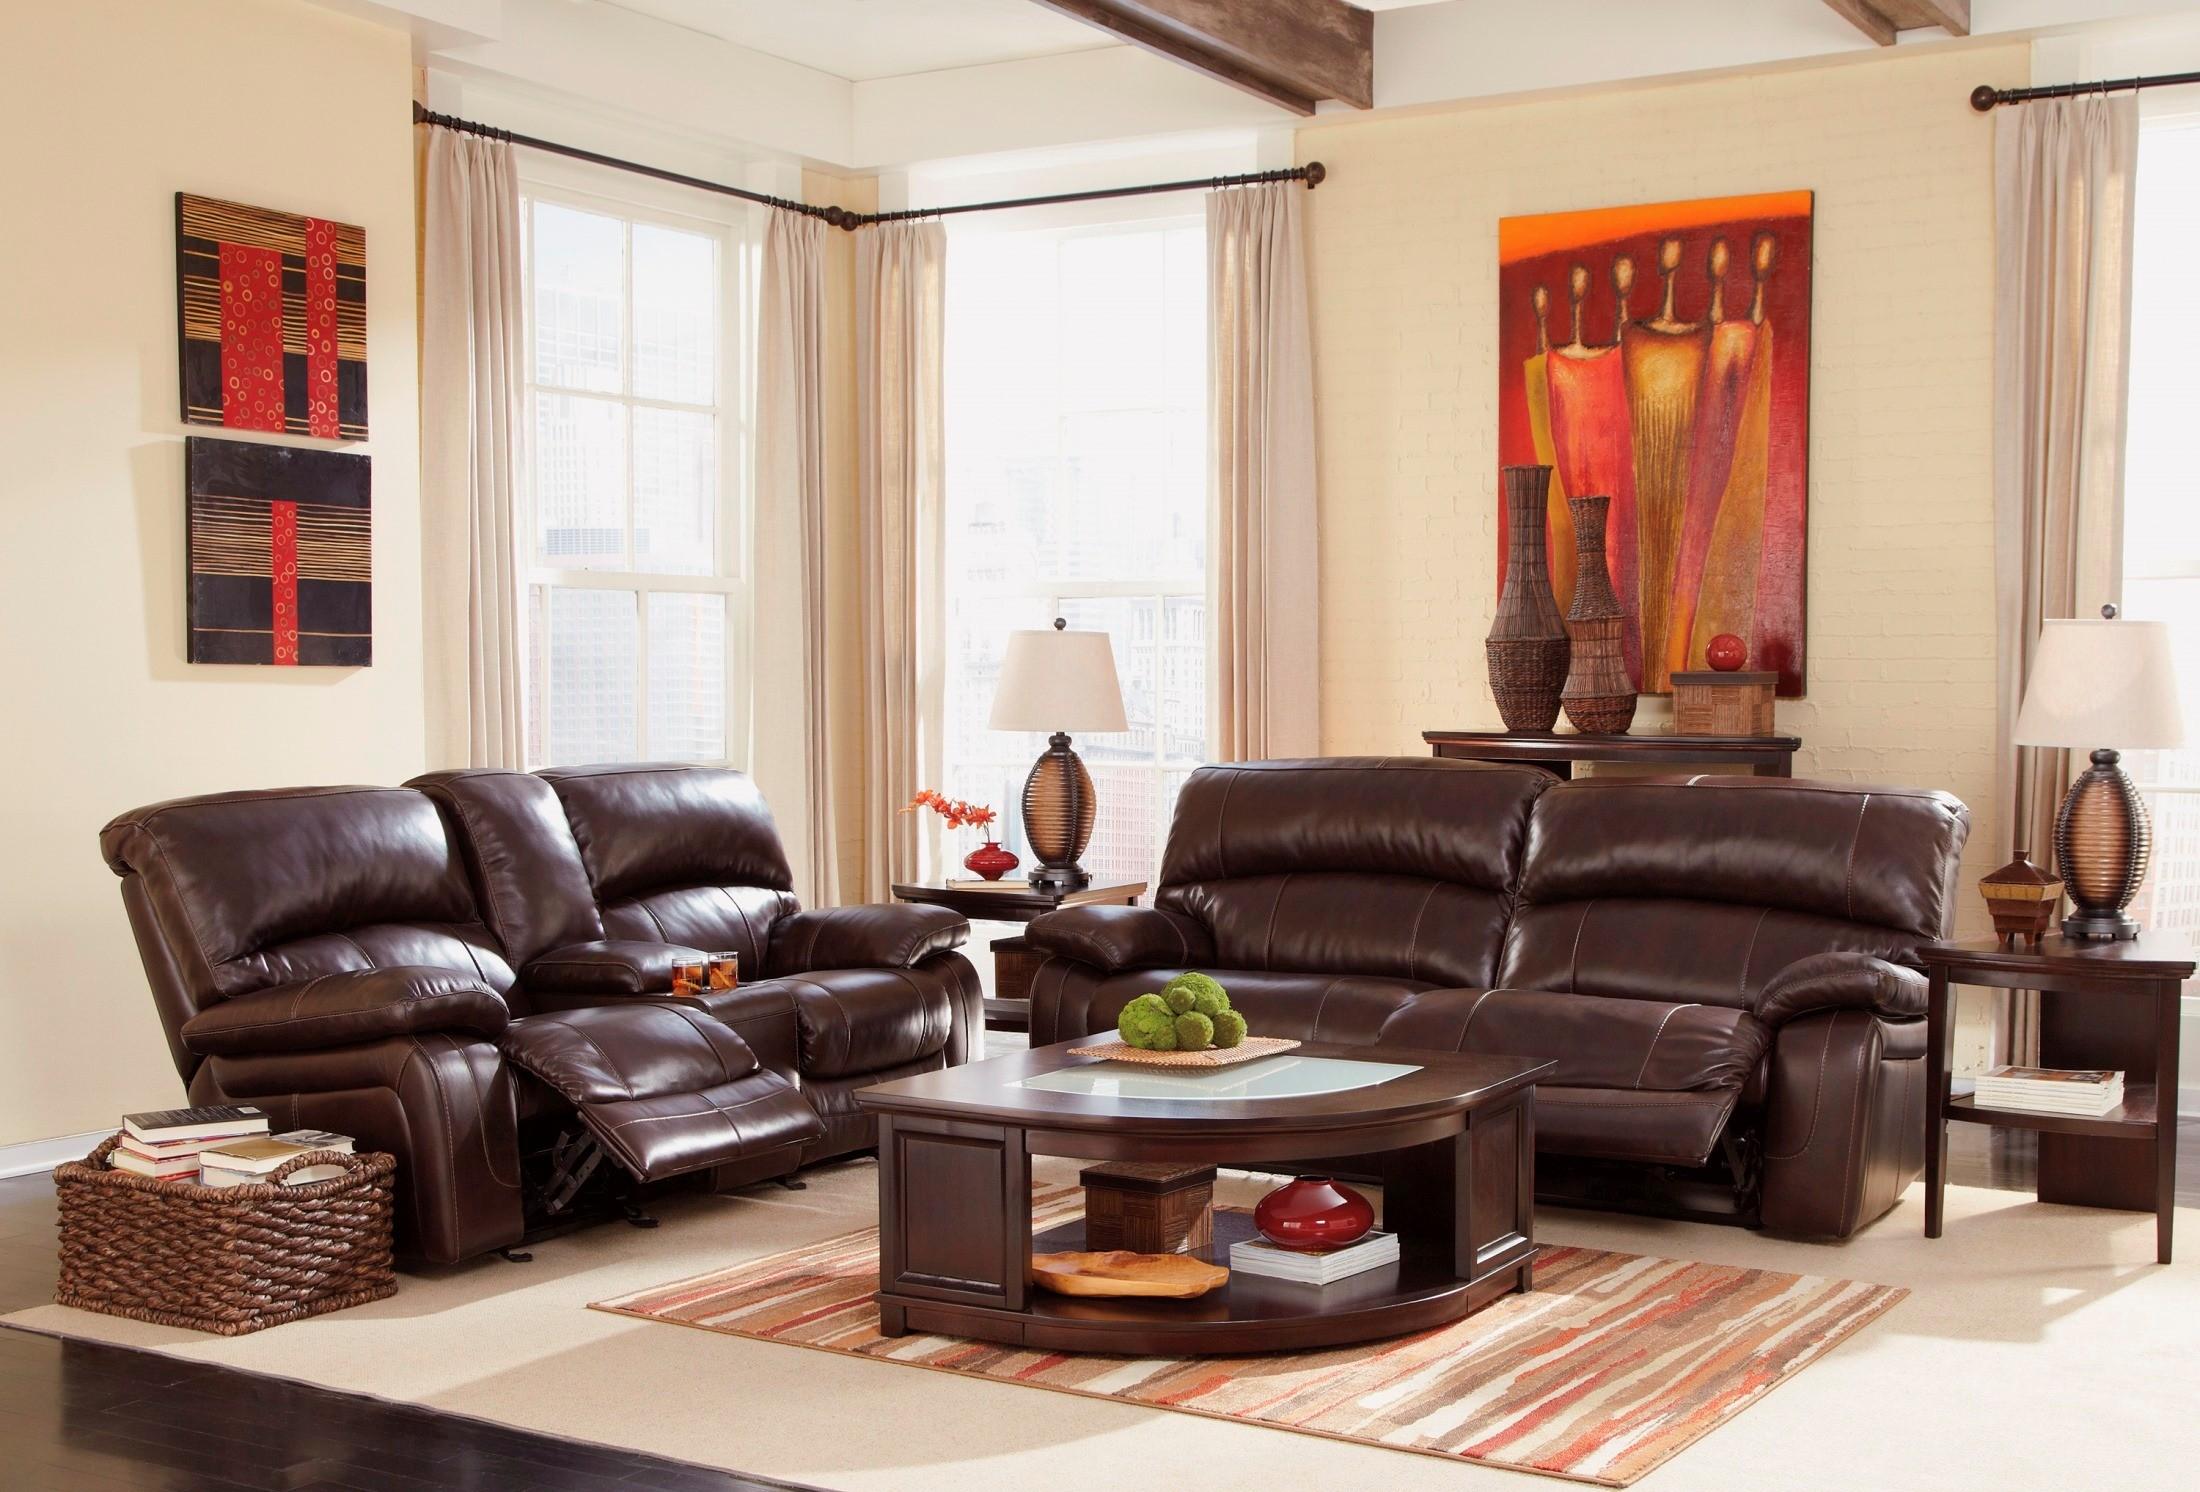 damacio dark brown power reclining living room set from ashley u9820047 91 coleman furniture. Black Bedroom Furniture Sets. Home Design Ideas